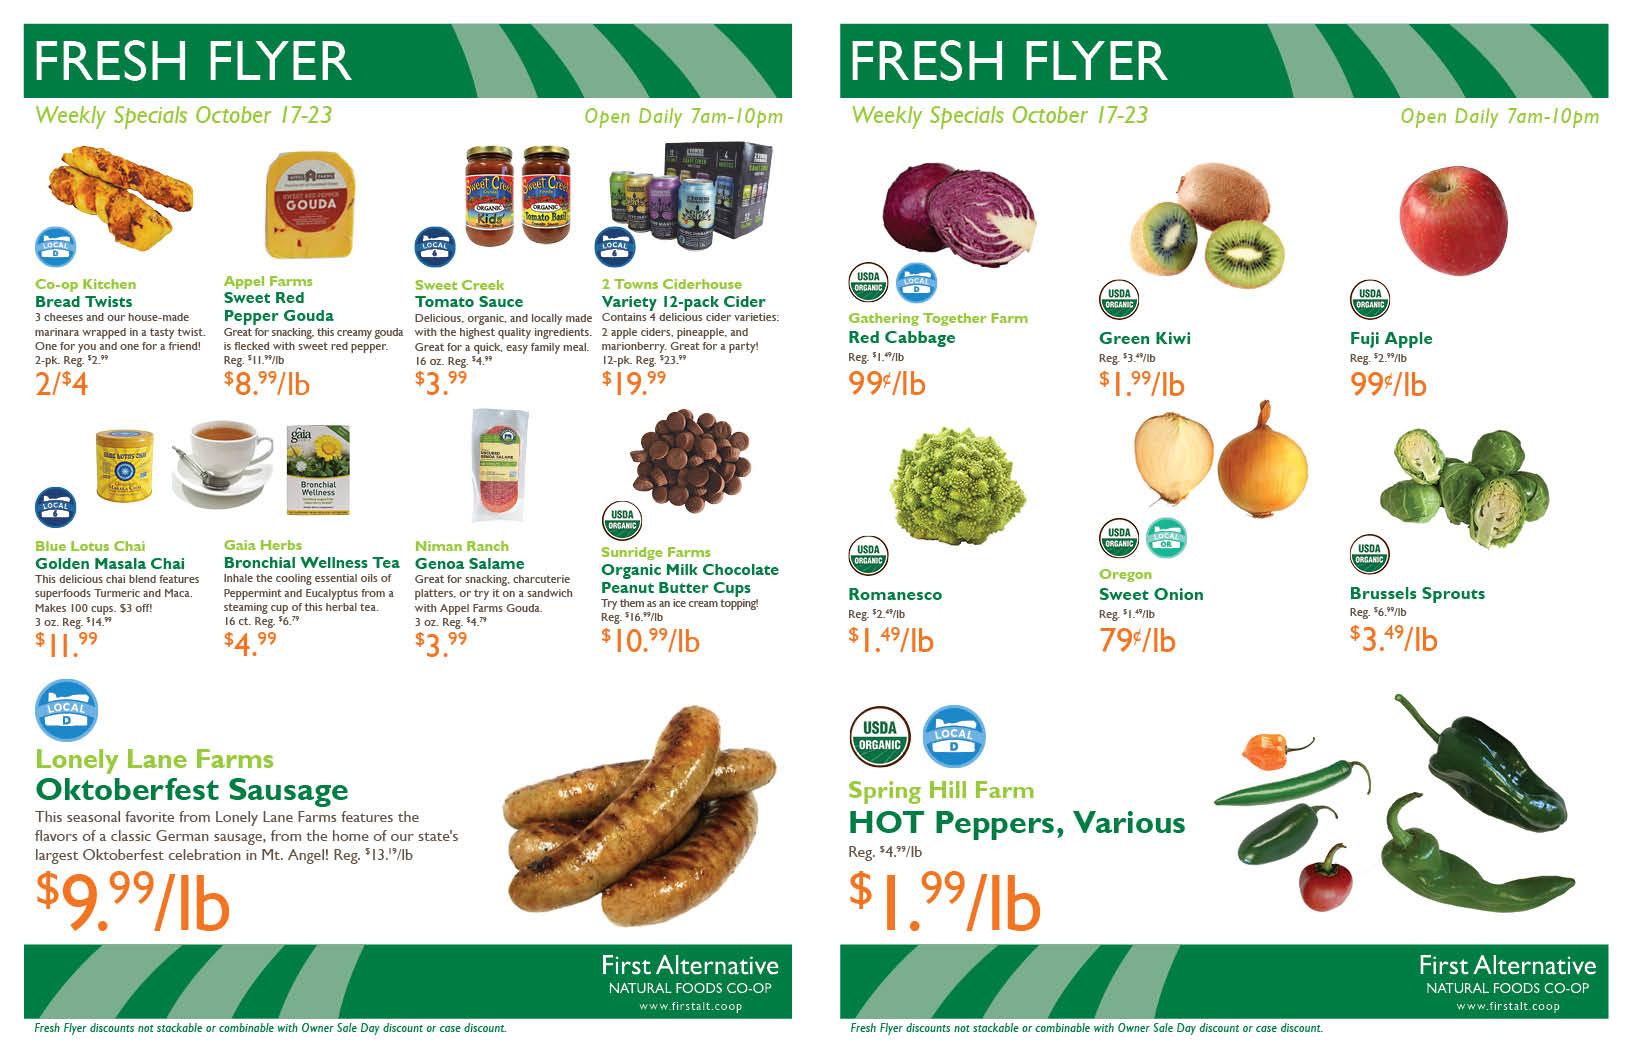 First Alternative Fresh Flyer Oct 17-23